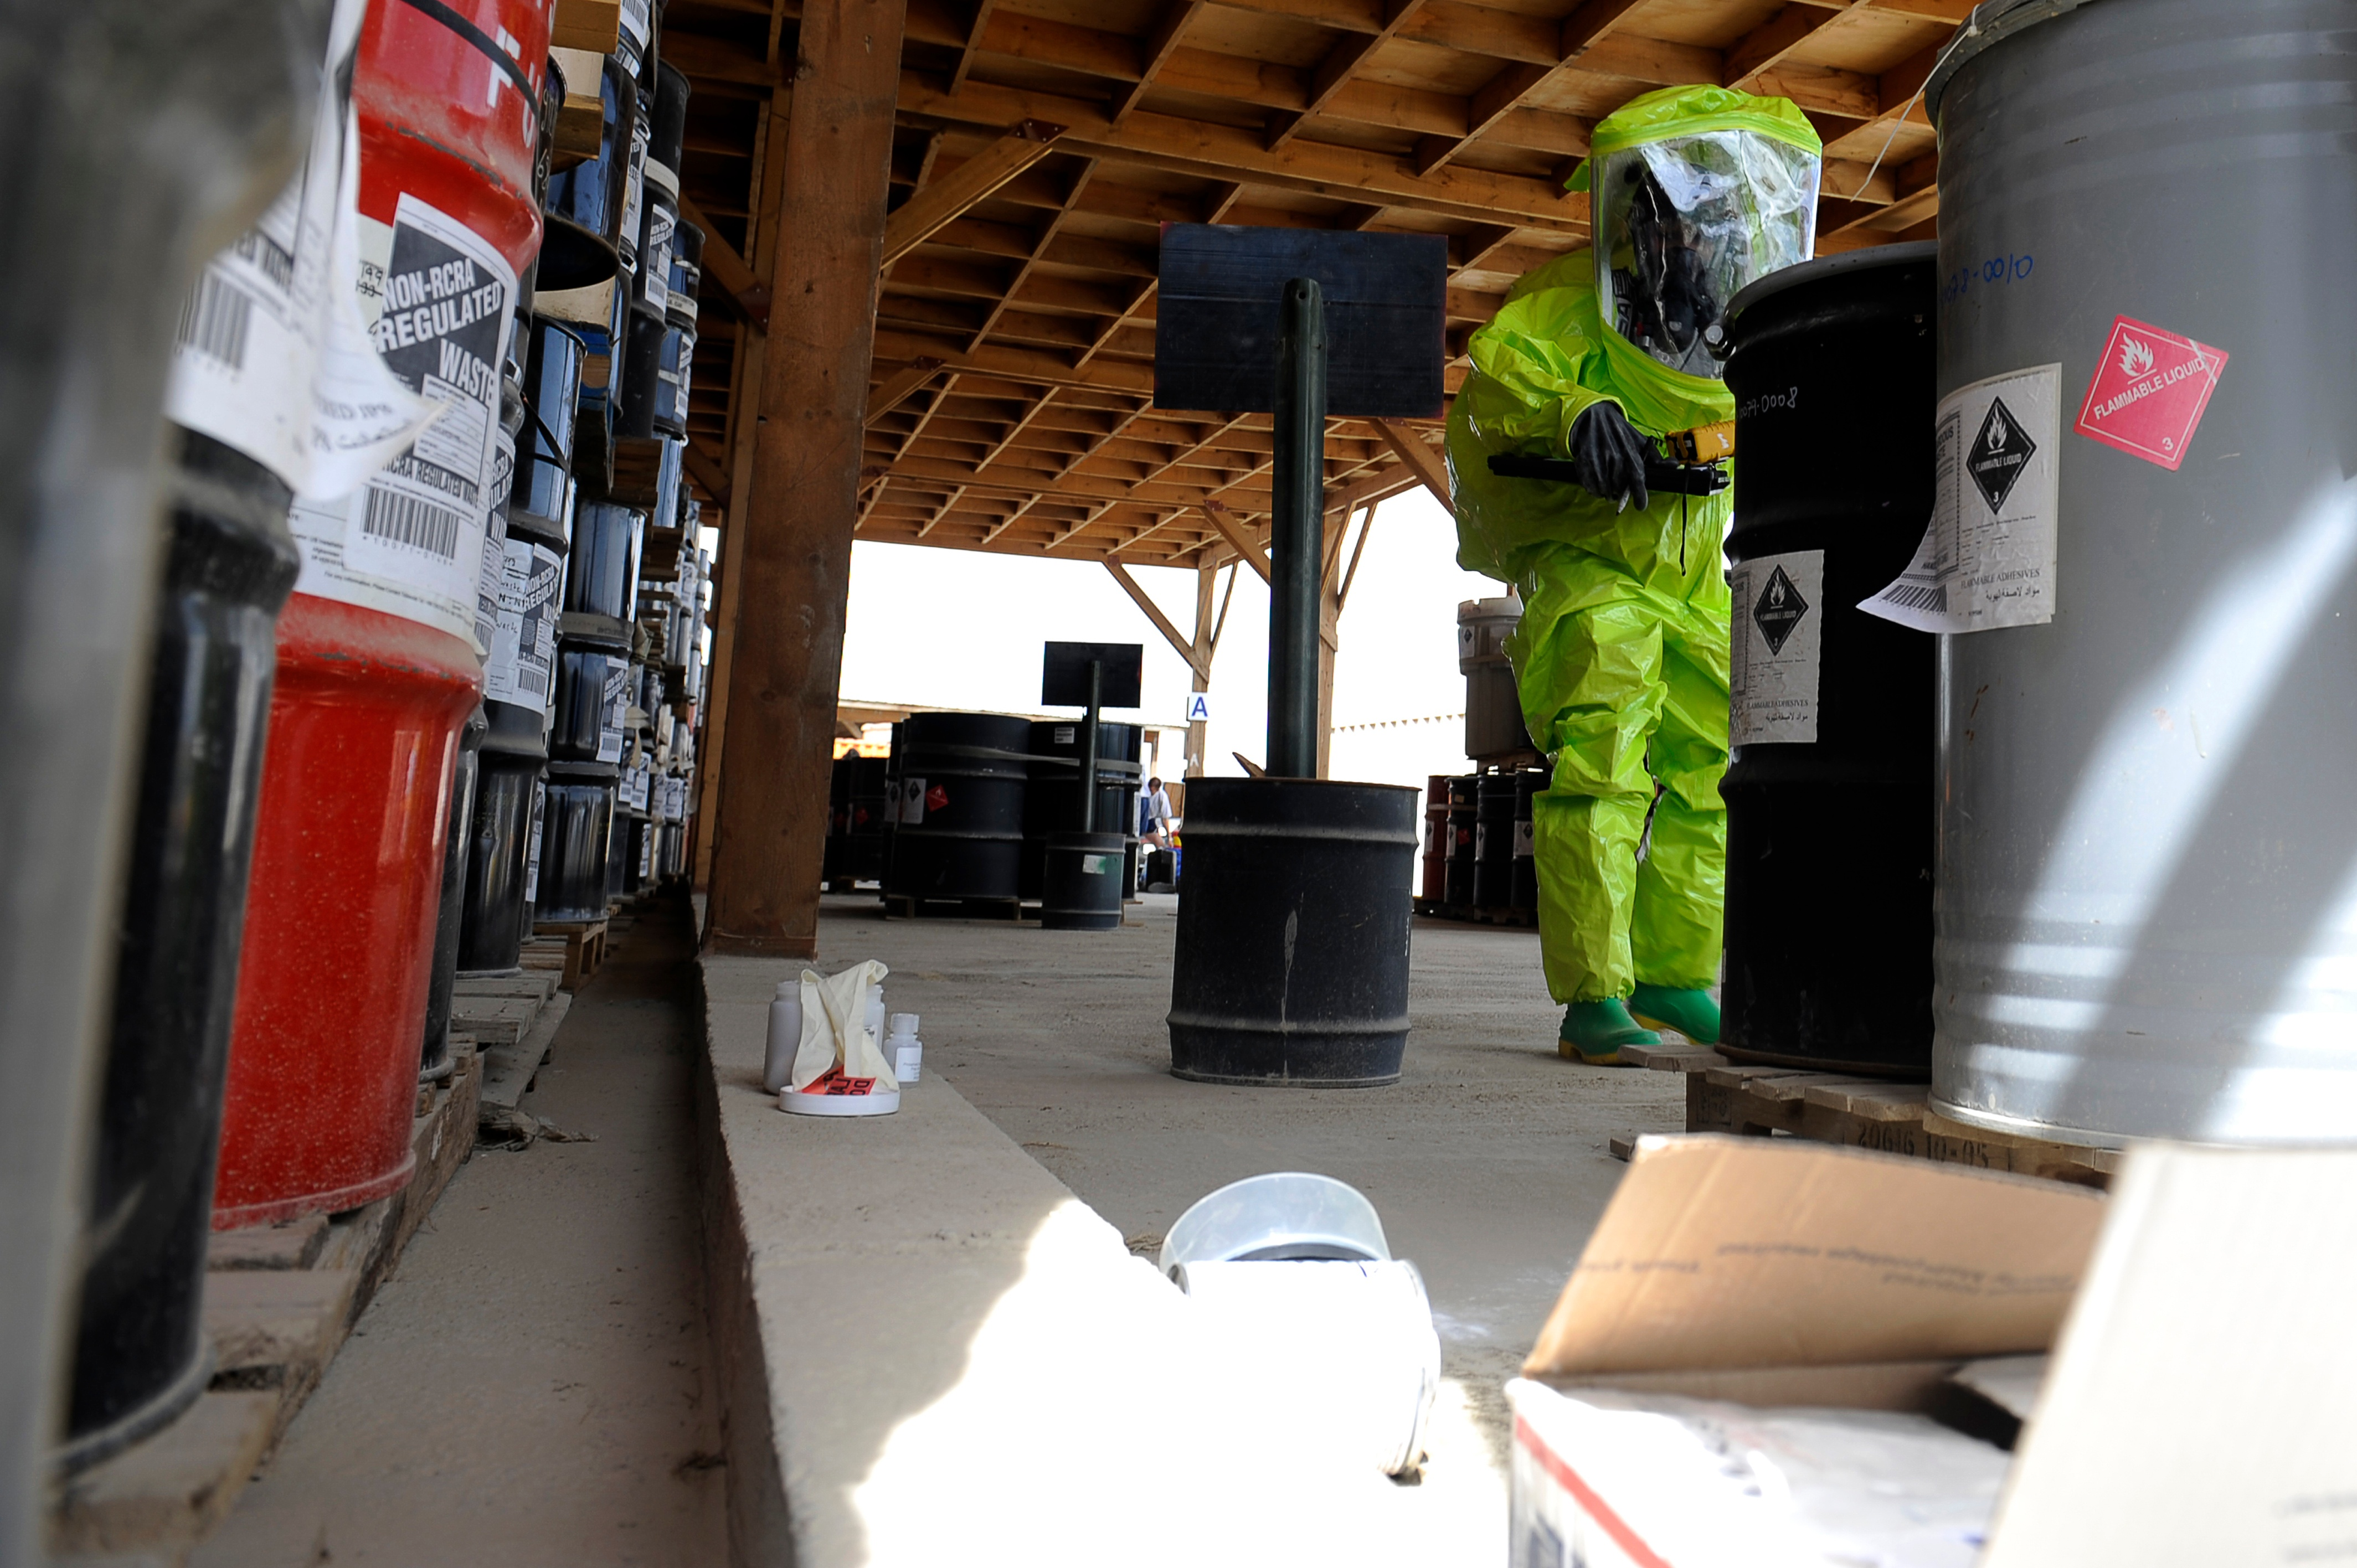 455th_AEW_Hazardous_Materials_Exercise_DVIDS275970